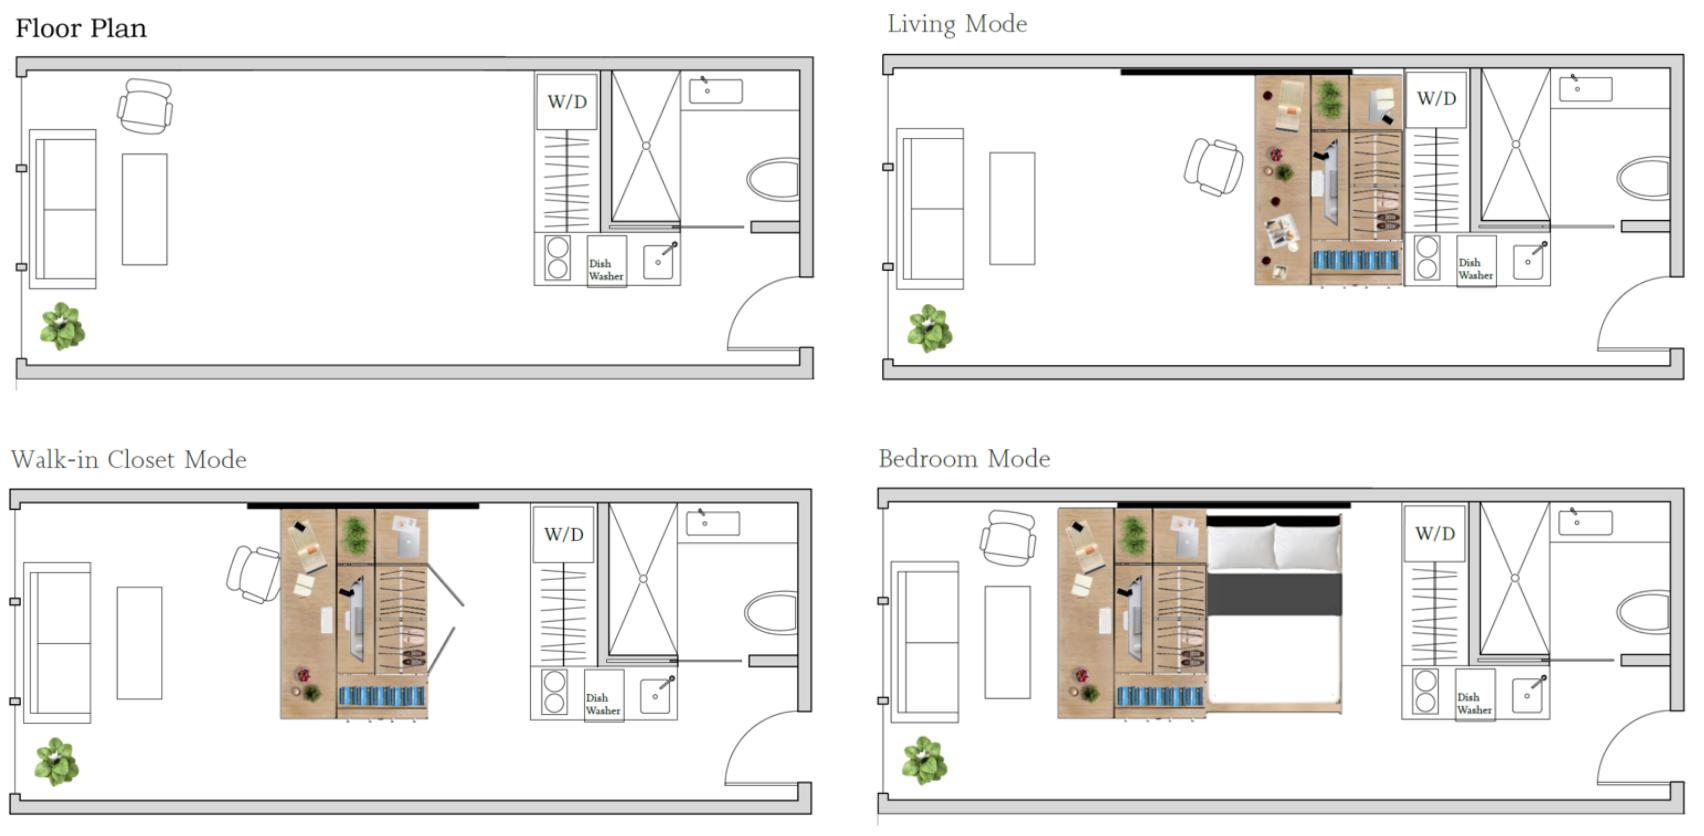 floor plan modes.PNG